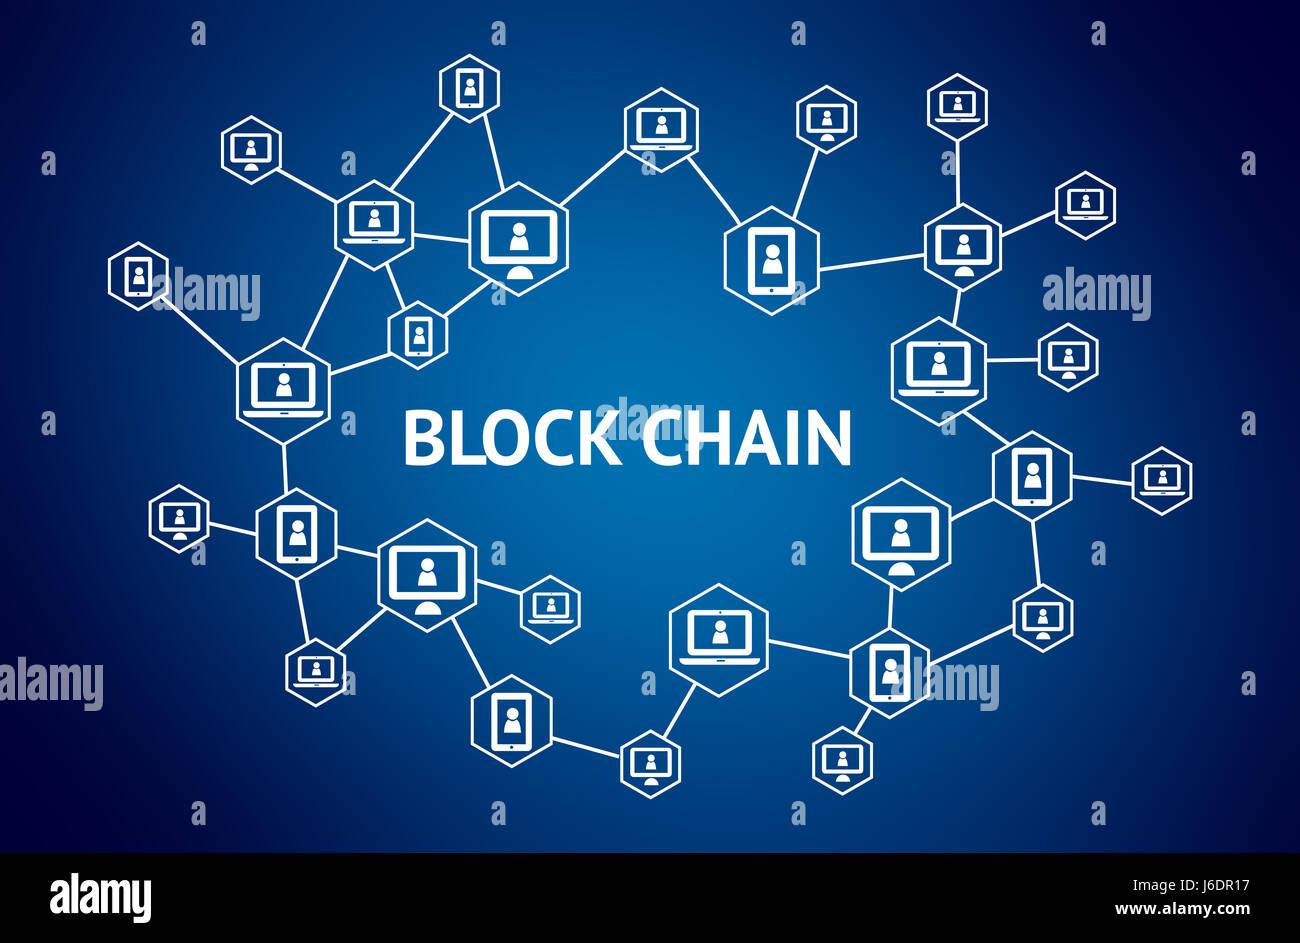 blockchain ledger how to write